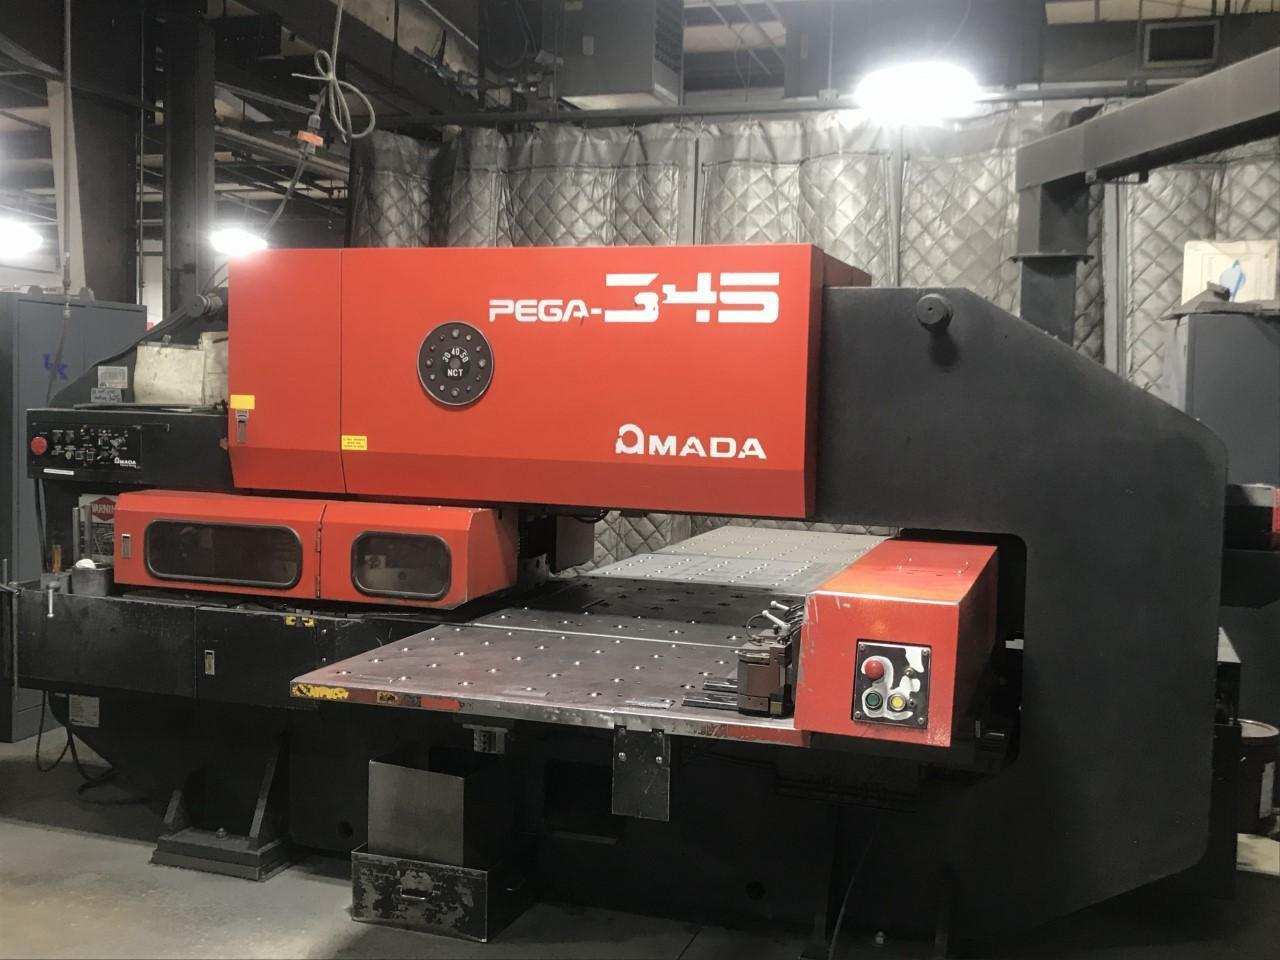 "1990 Amada Pega345Q CNC Turret Punch, 33 Ton, 40"" x 50"" Travels"